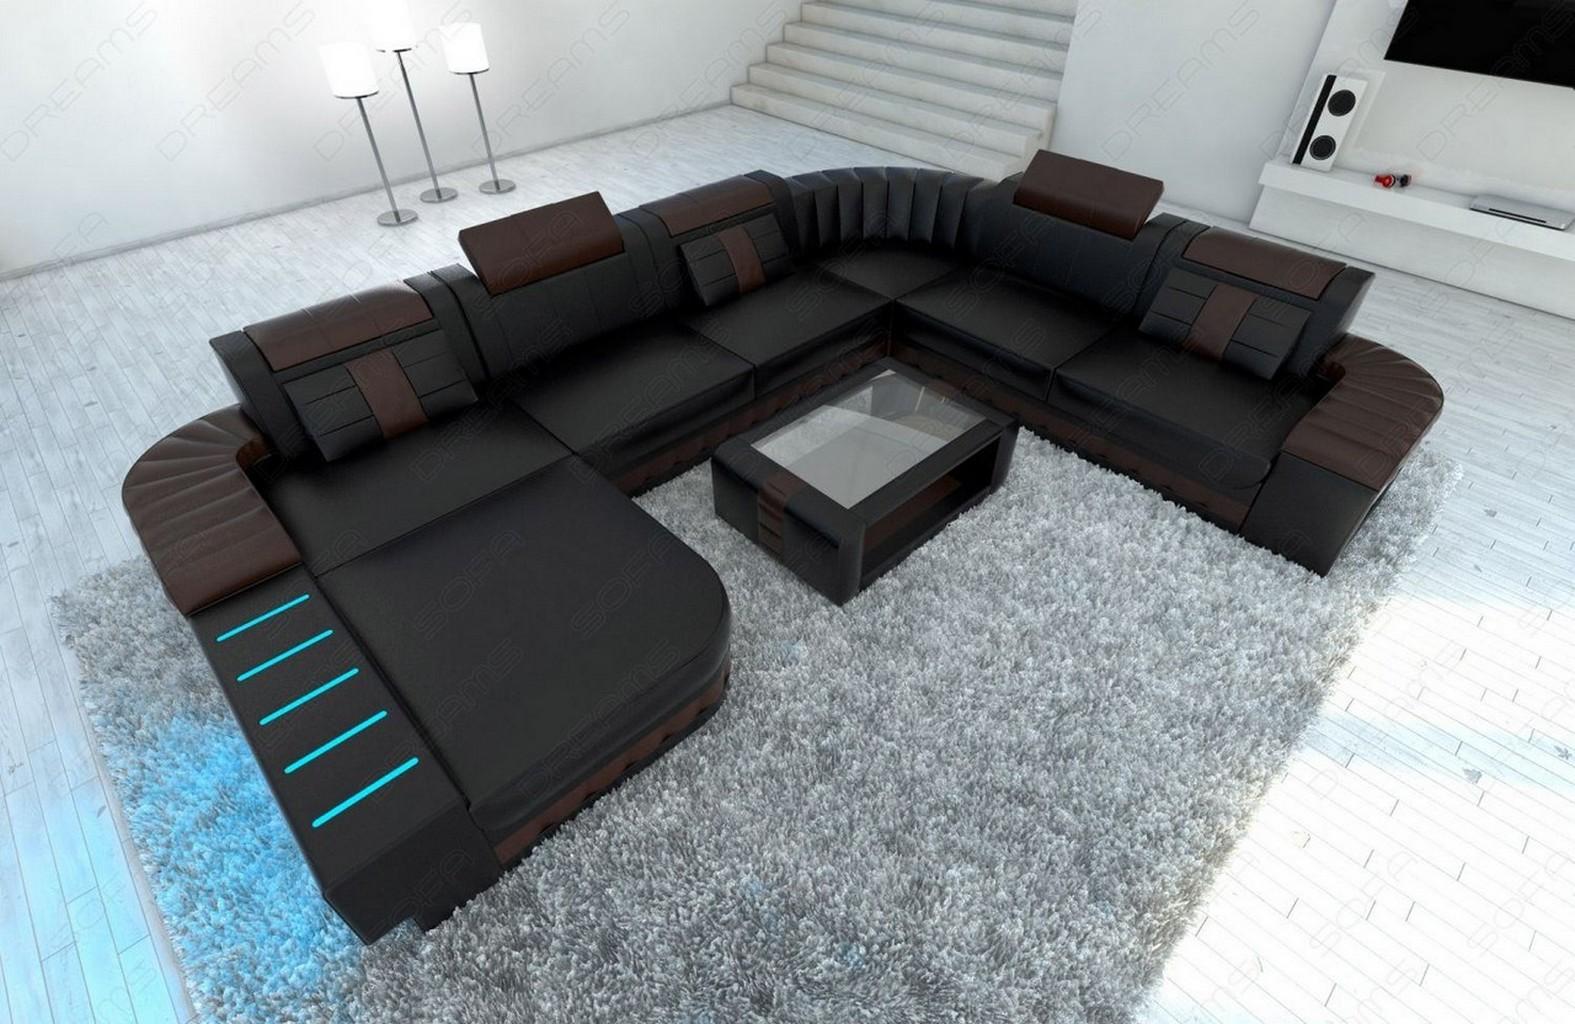 xxl sectional sofa bellagio led u shaped black darkbrown. Black Bedroom Furniture Sets. Home Design Ideas